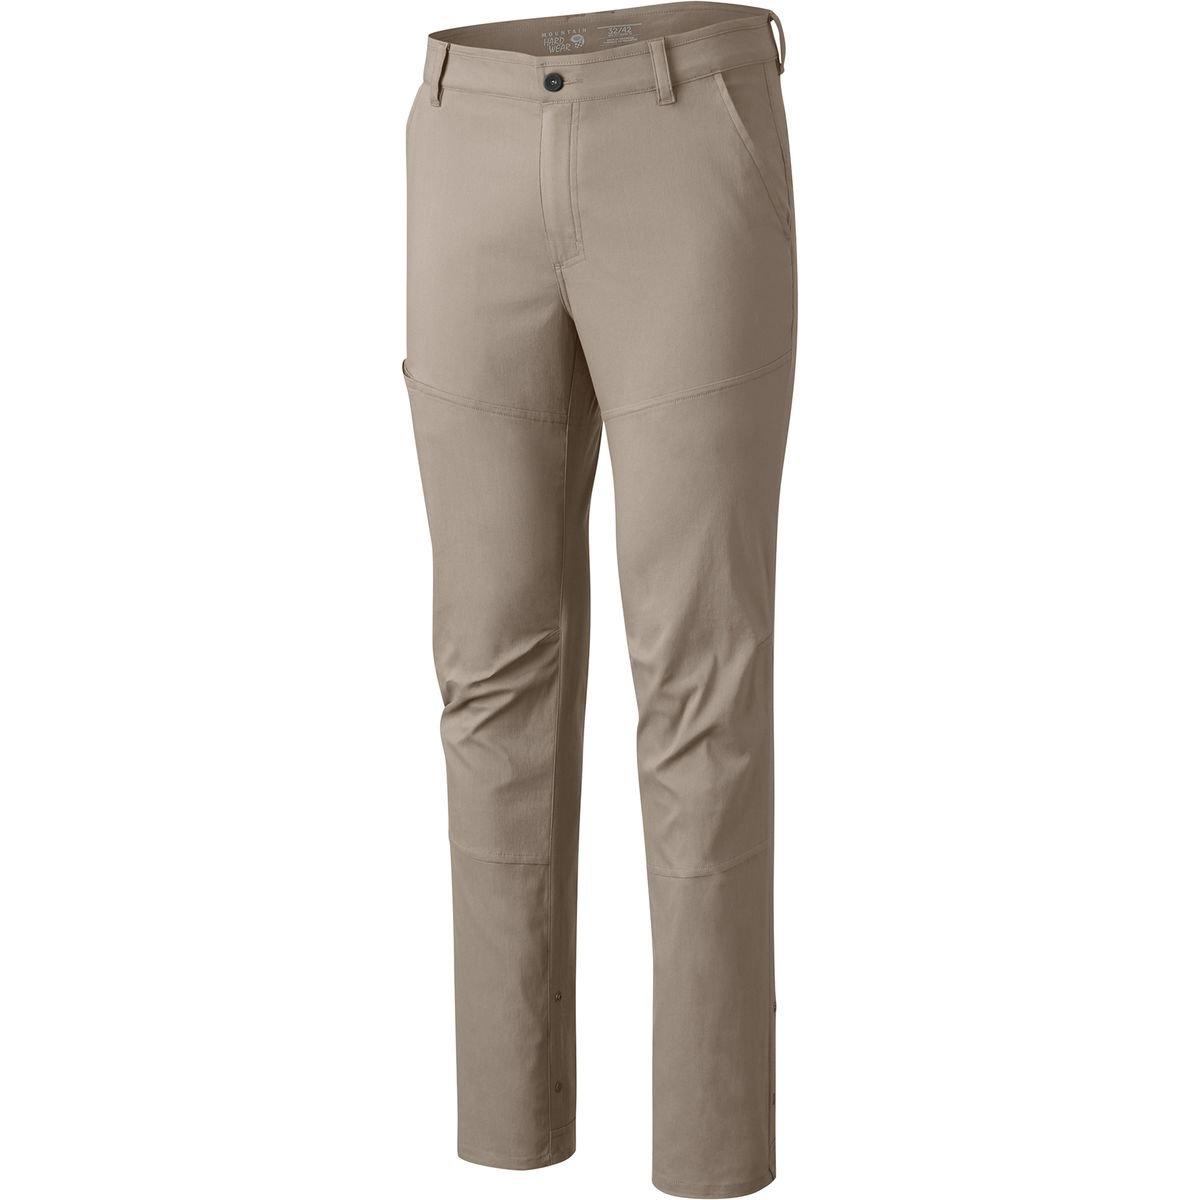 Mountain Hardwear Hardwear AP Pants – Men 's B01GUNFDY8 カーキ,34x32